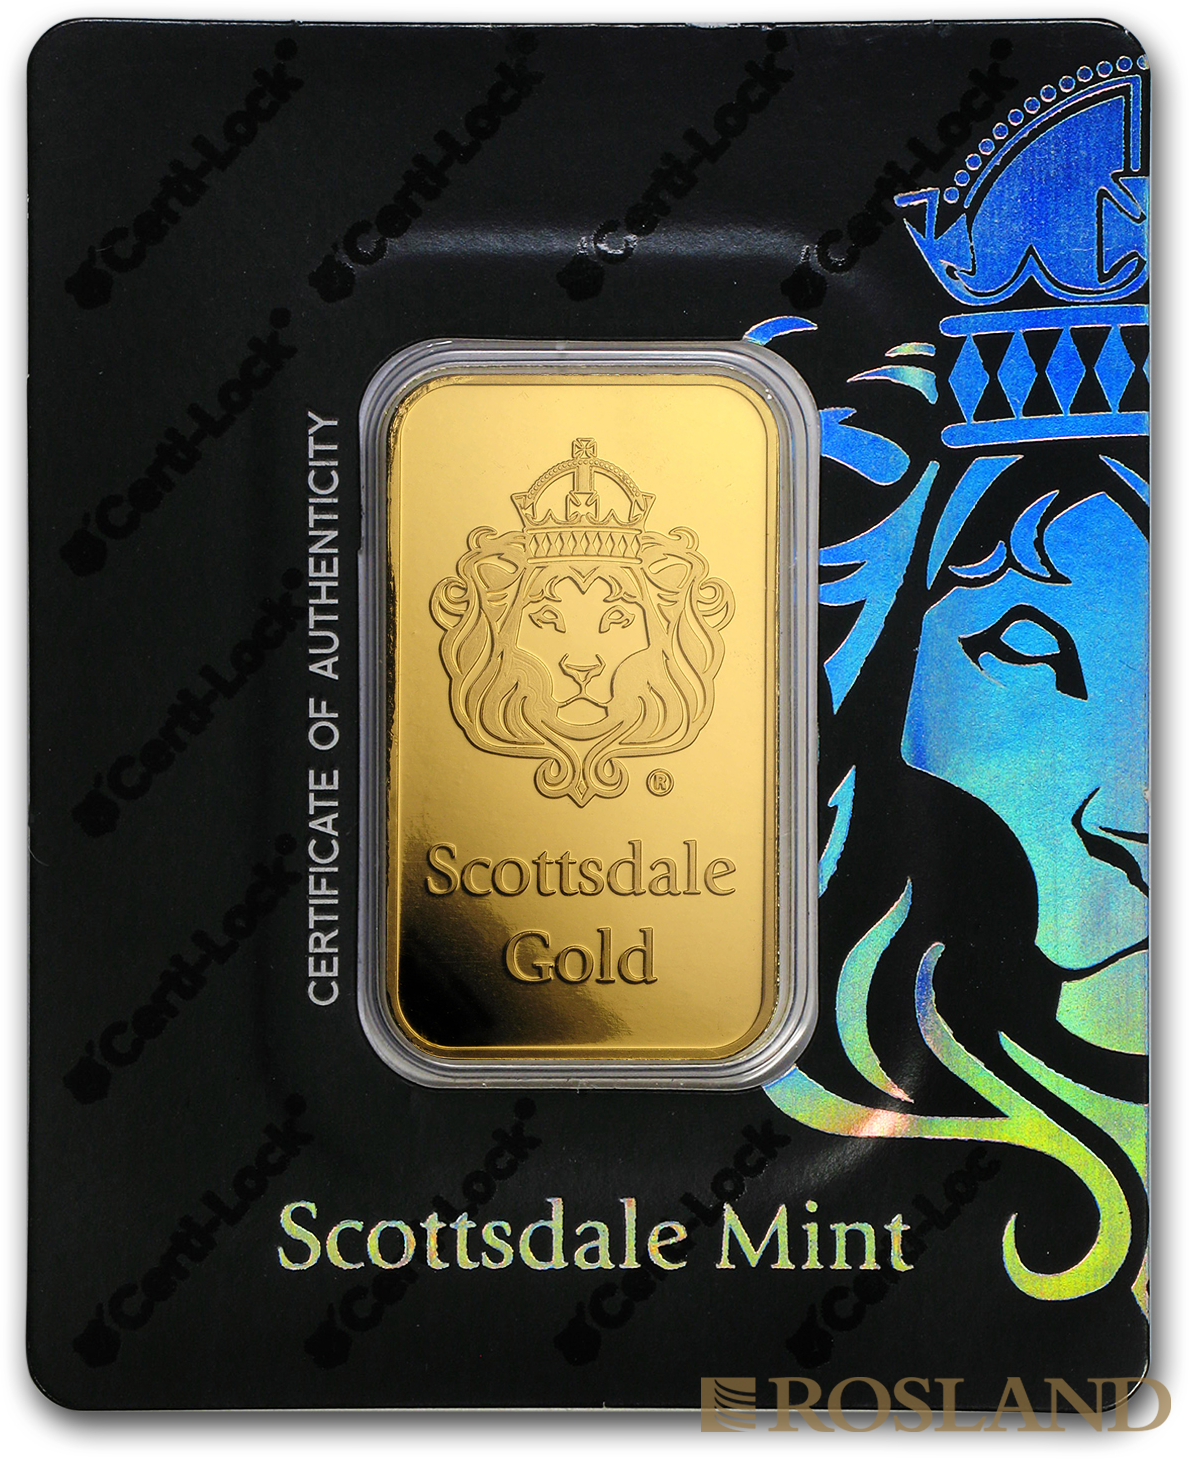 1 Unze Goldbarren Scottsdale Mint Löwe